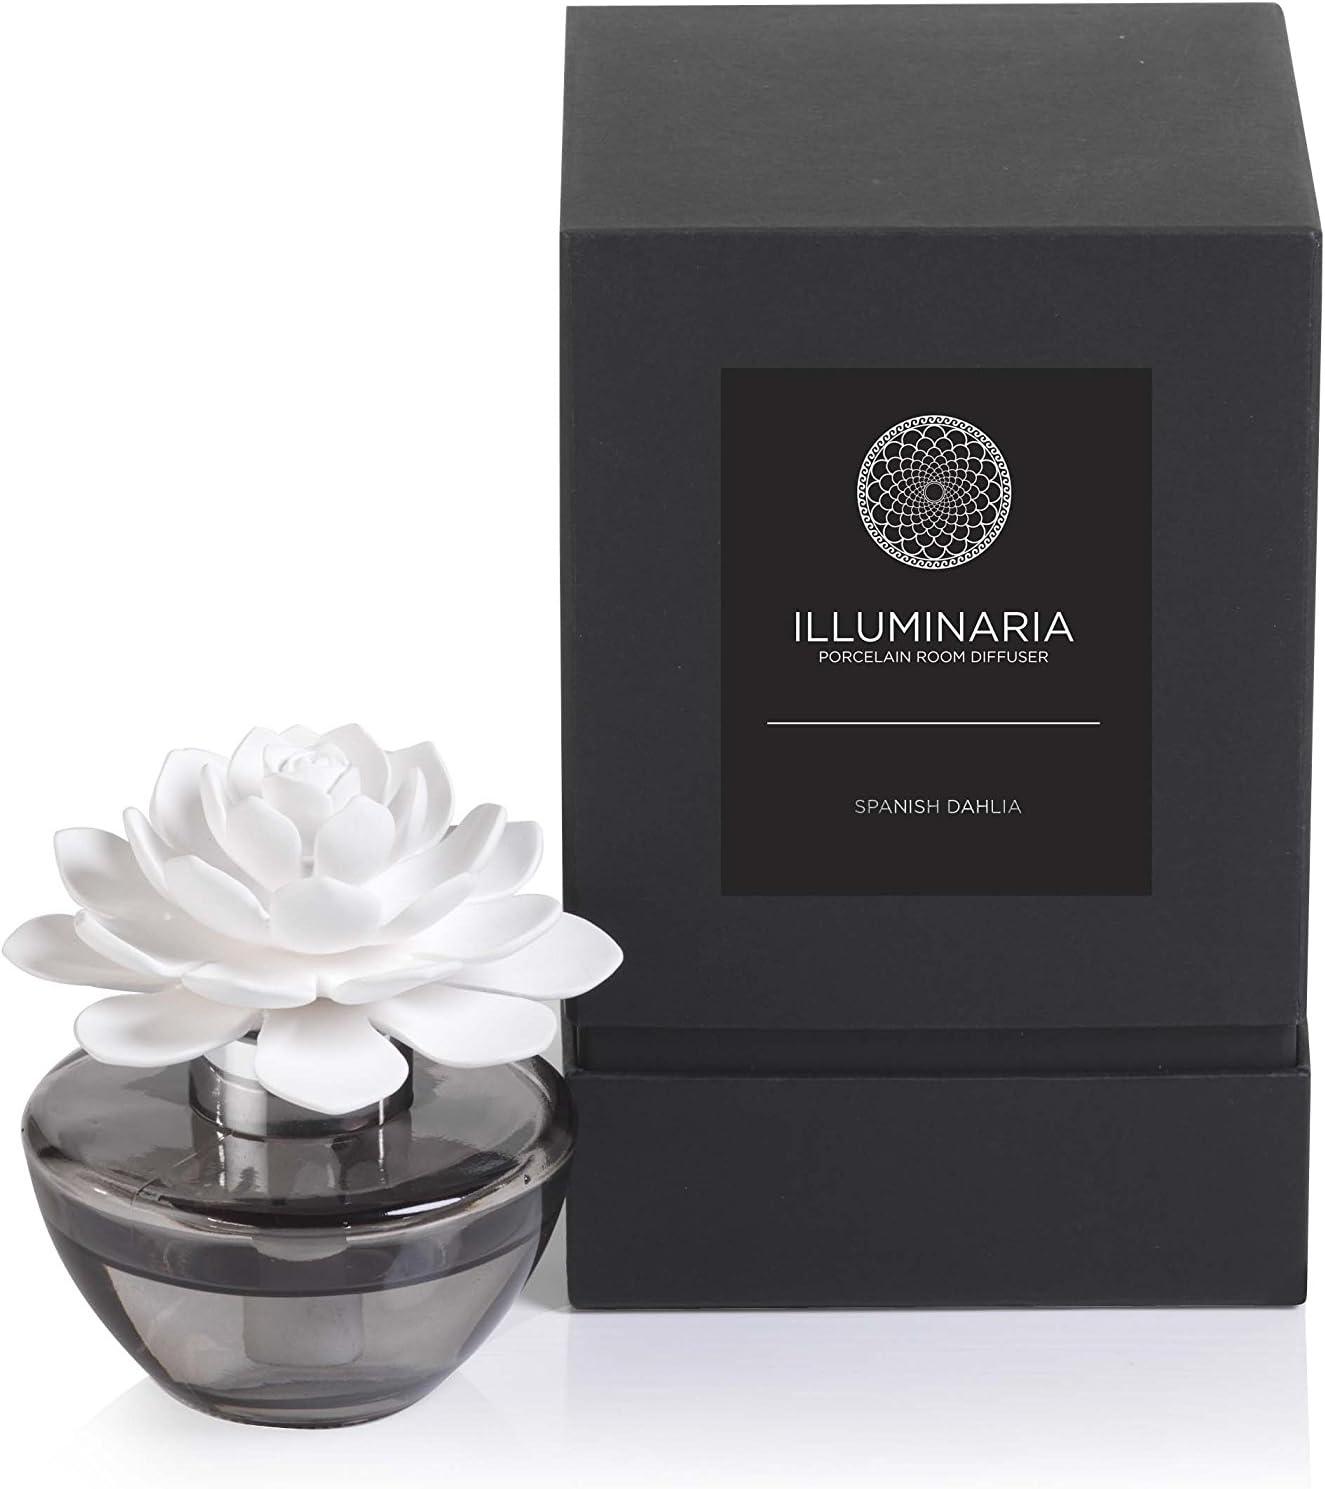 Zodax Illuminaria Porcelain Diffuser, Spanish Dahlia Fragrance